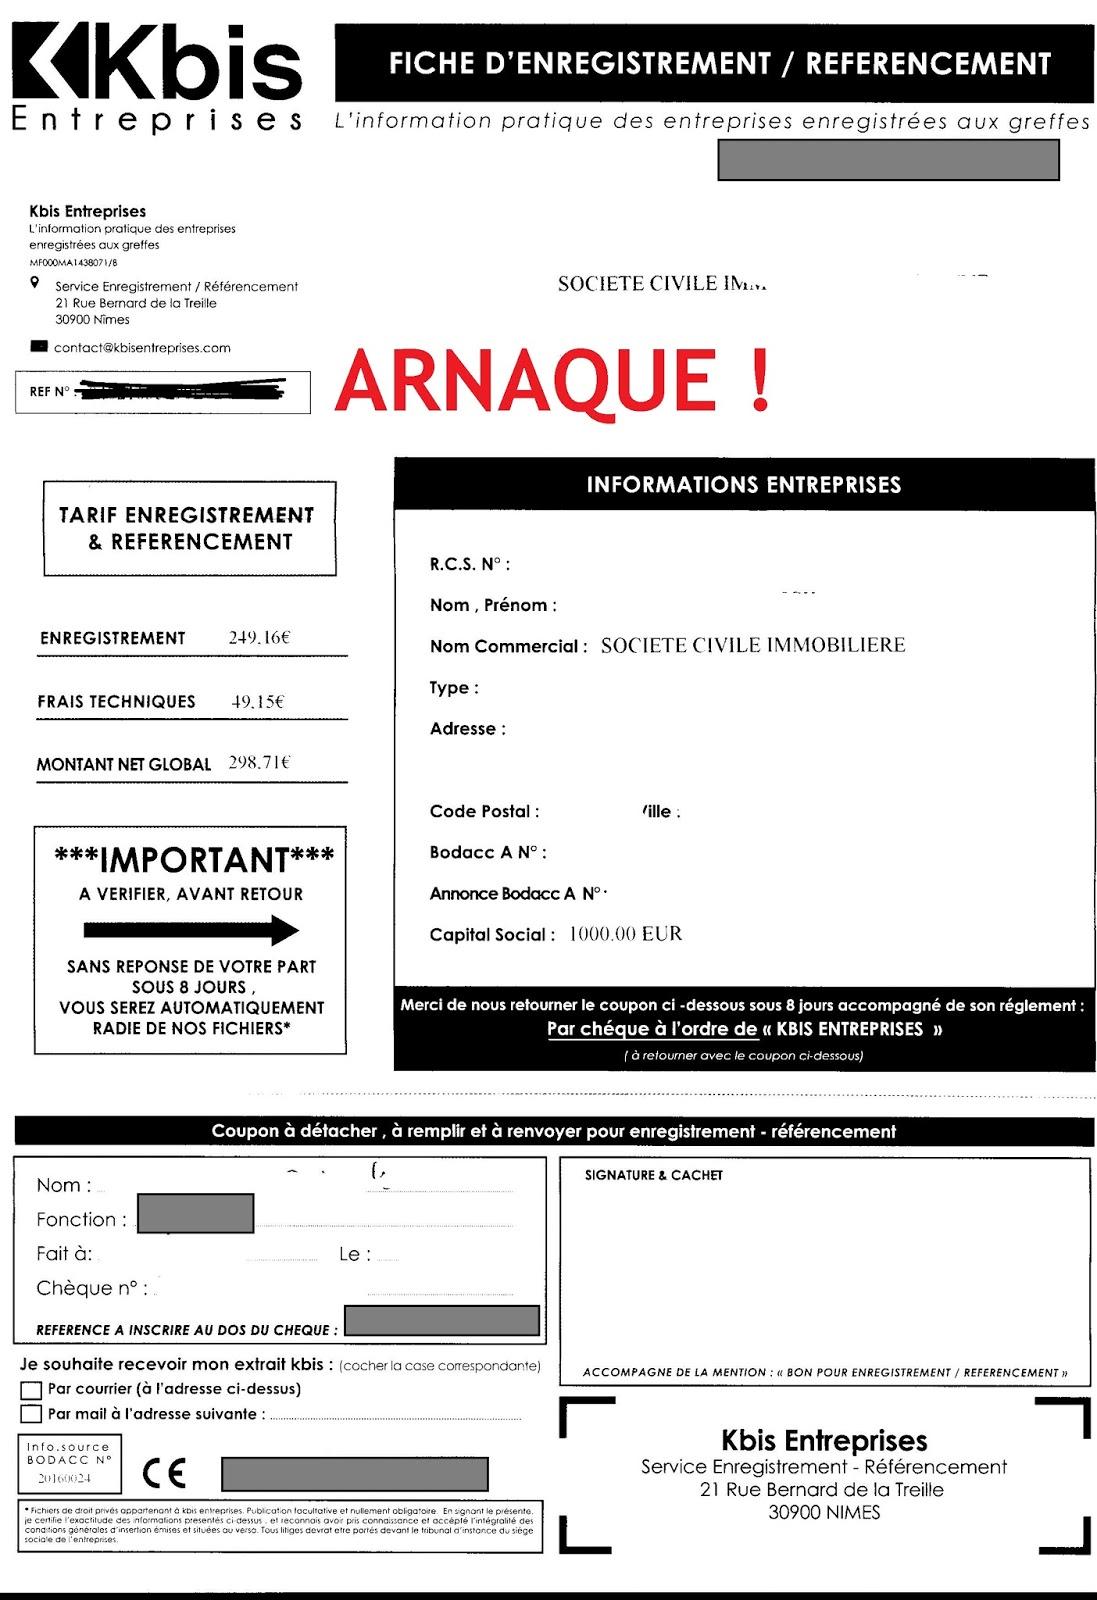 Arnaques entrepreneurs kbis entreprises for Idee auto entrepreneur 2016